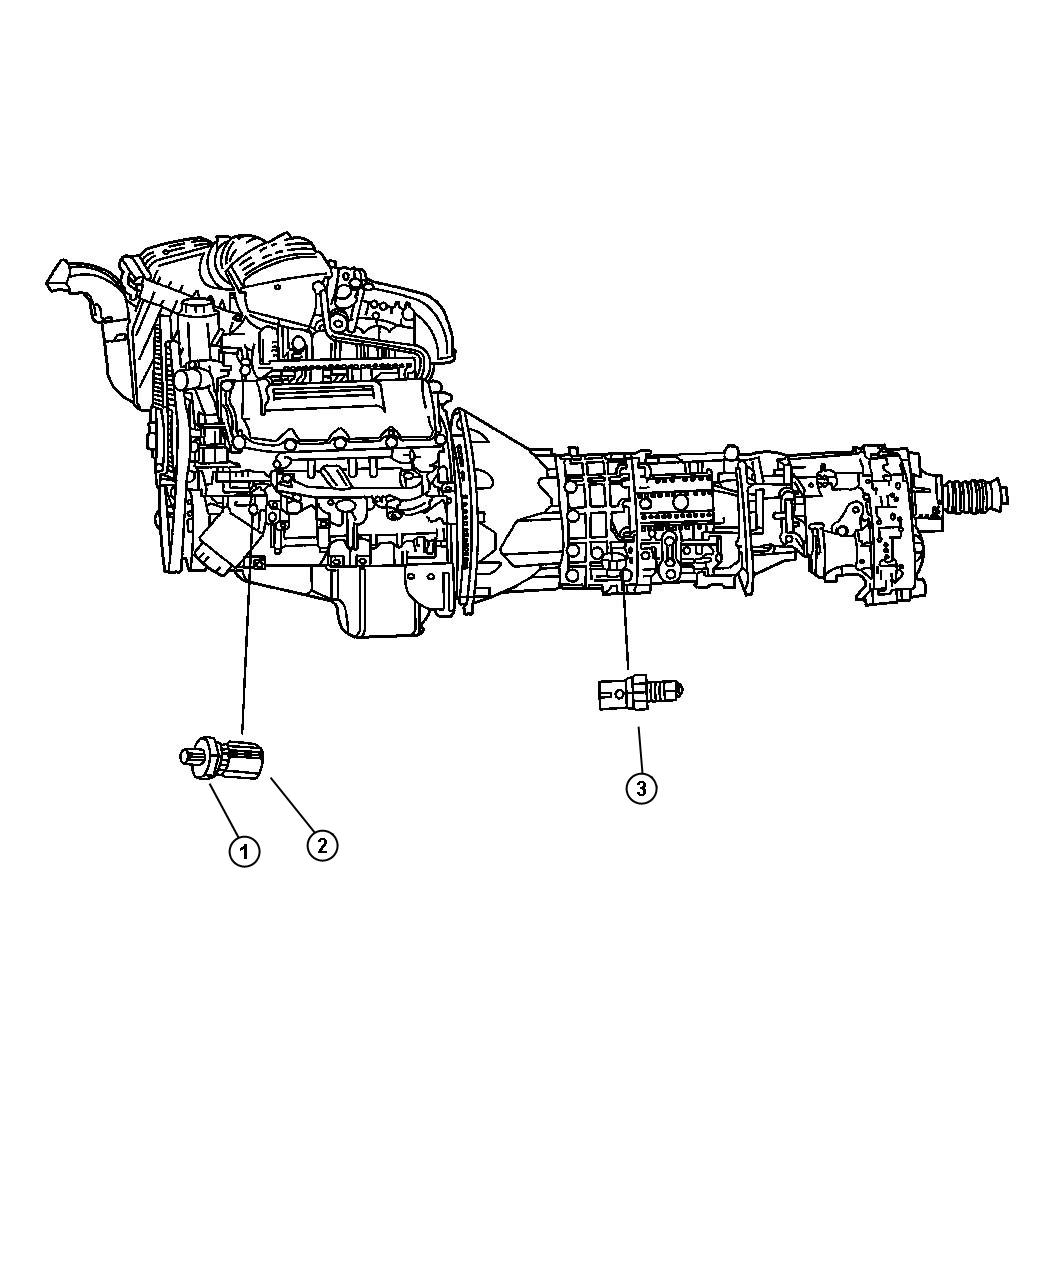 Dodge Grand Caravan Switch Oil Pressure Engine